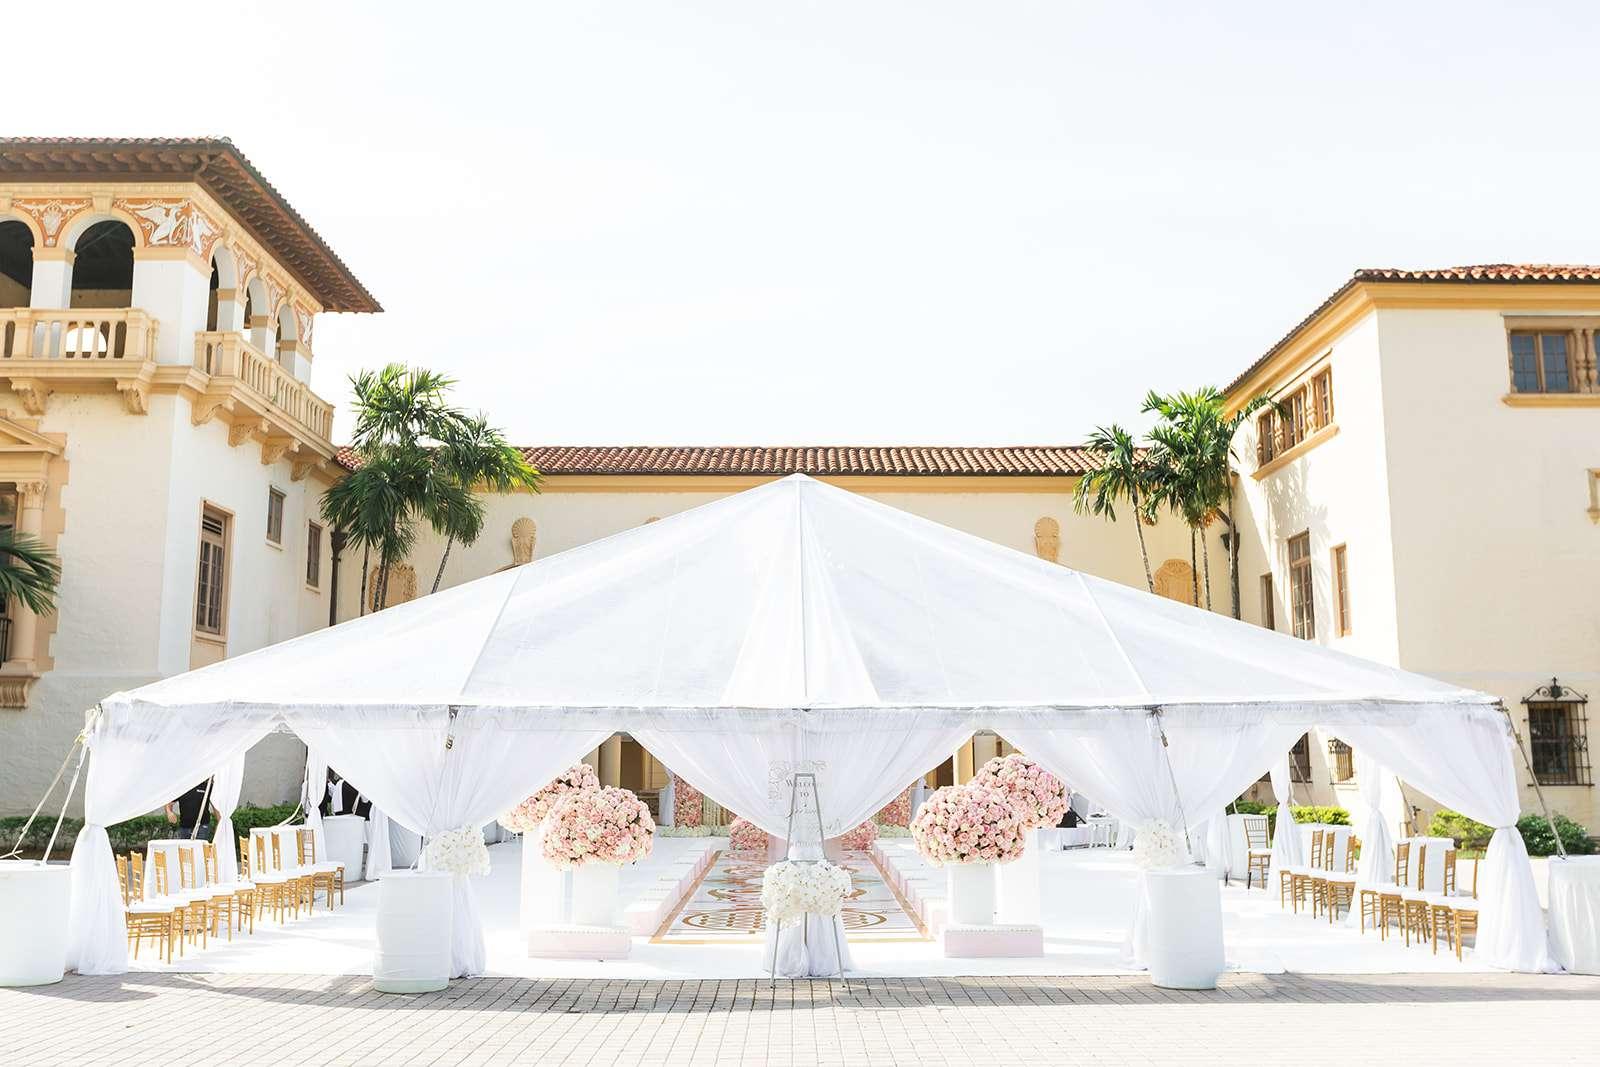 Wedding venue tent